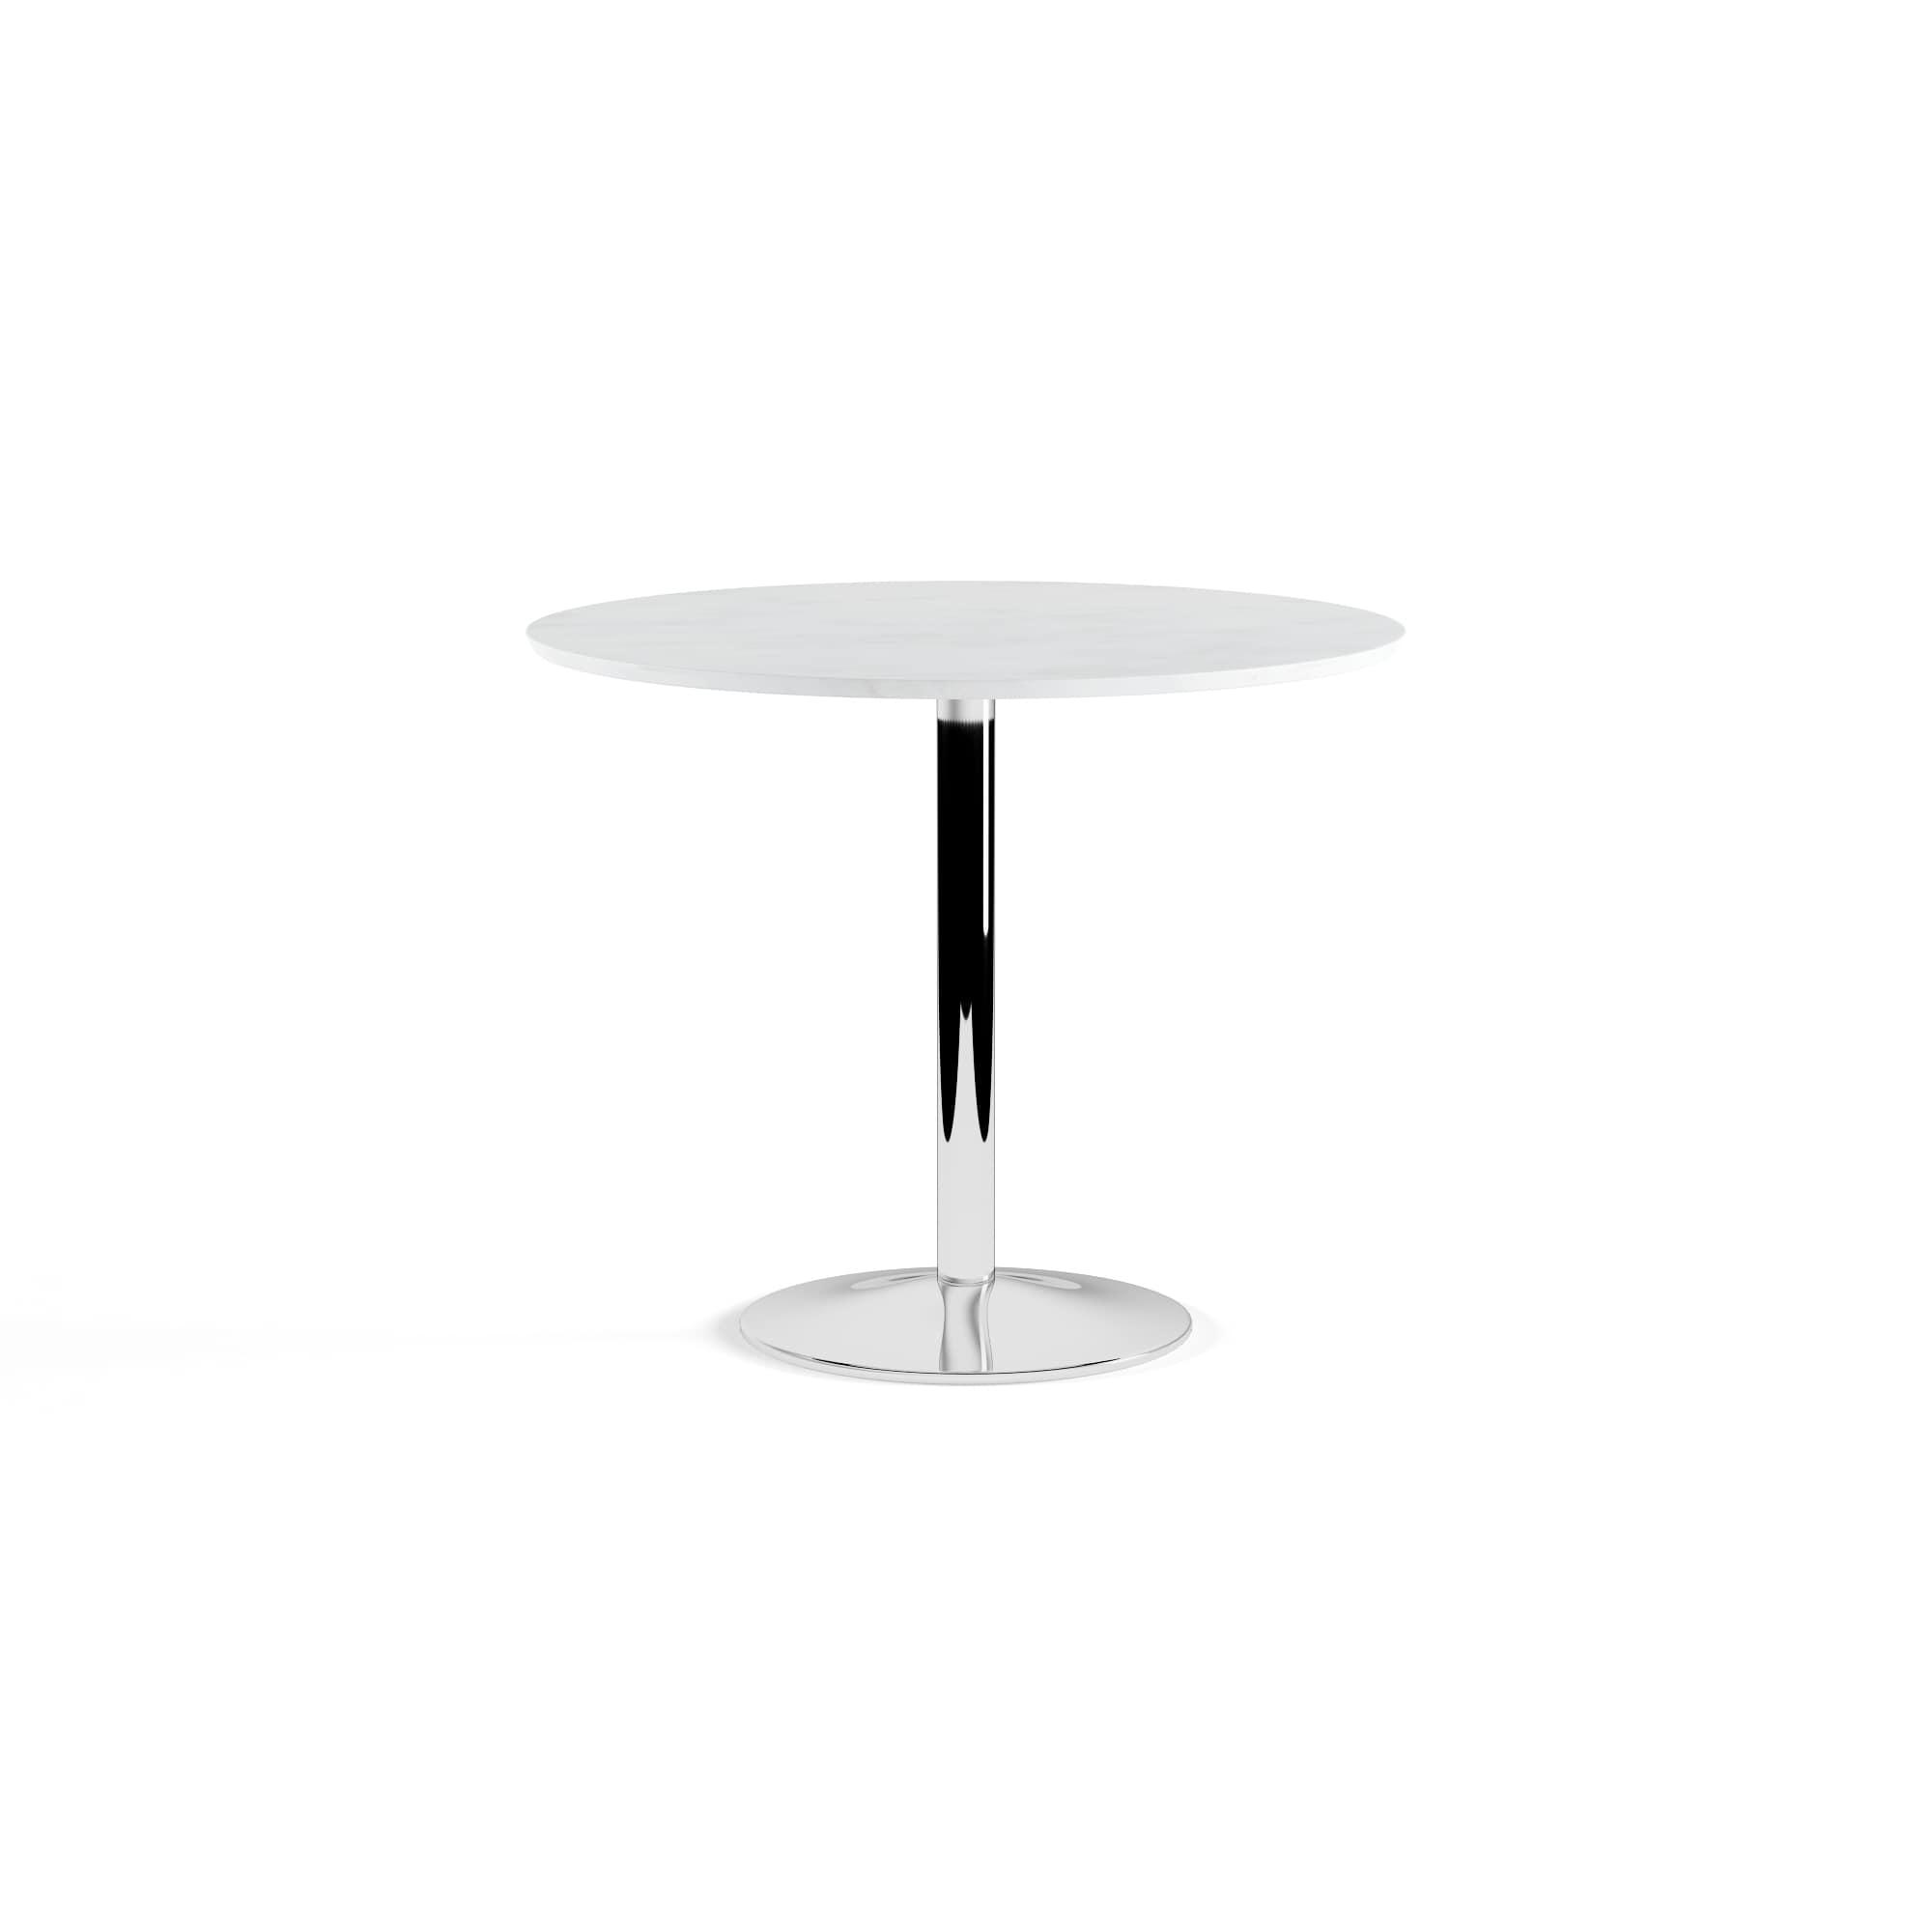 & Den Third Ward Mason Round Dining Table White Table Top